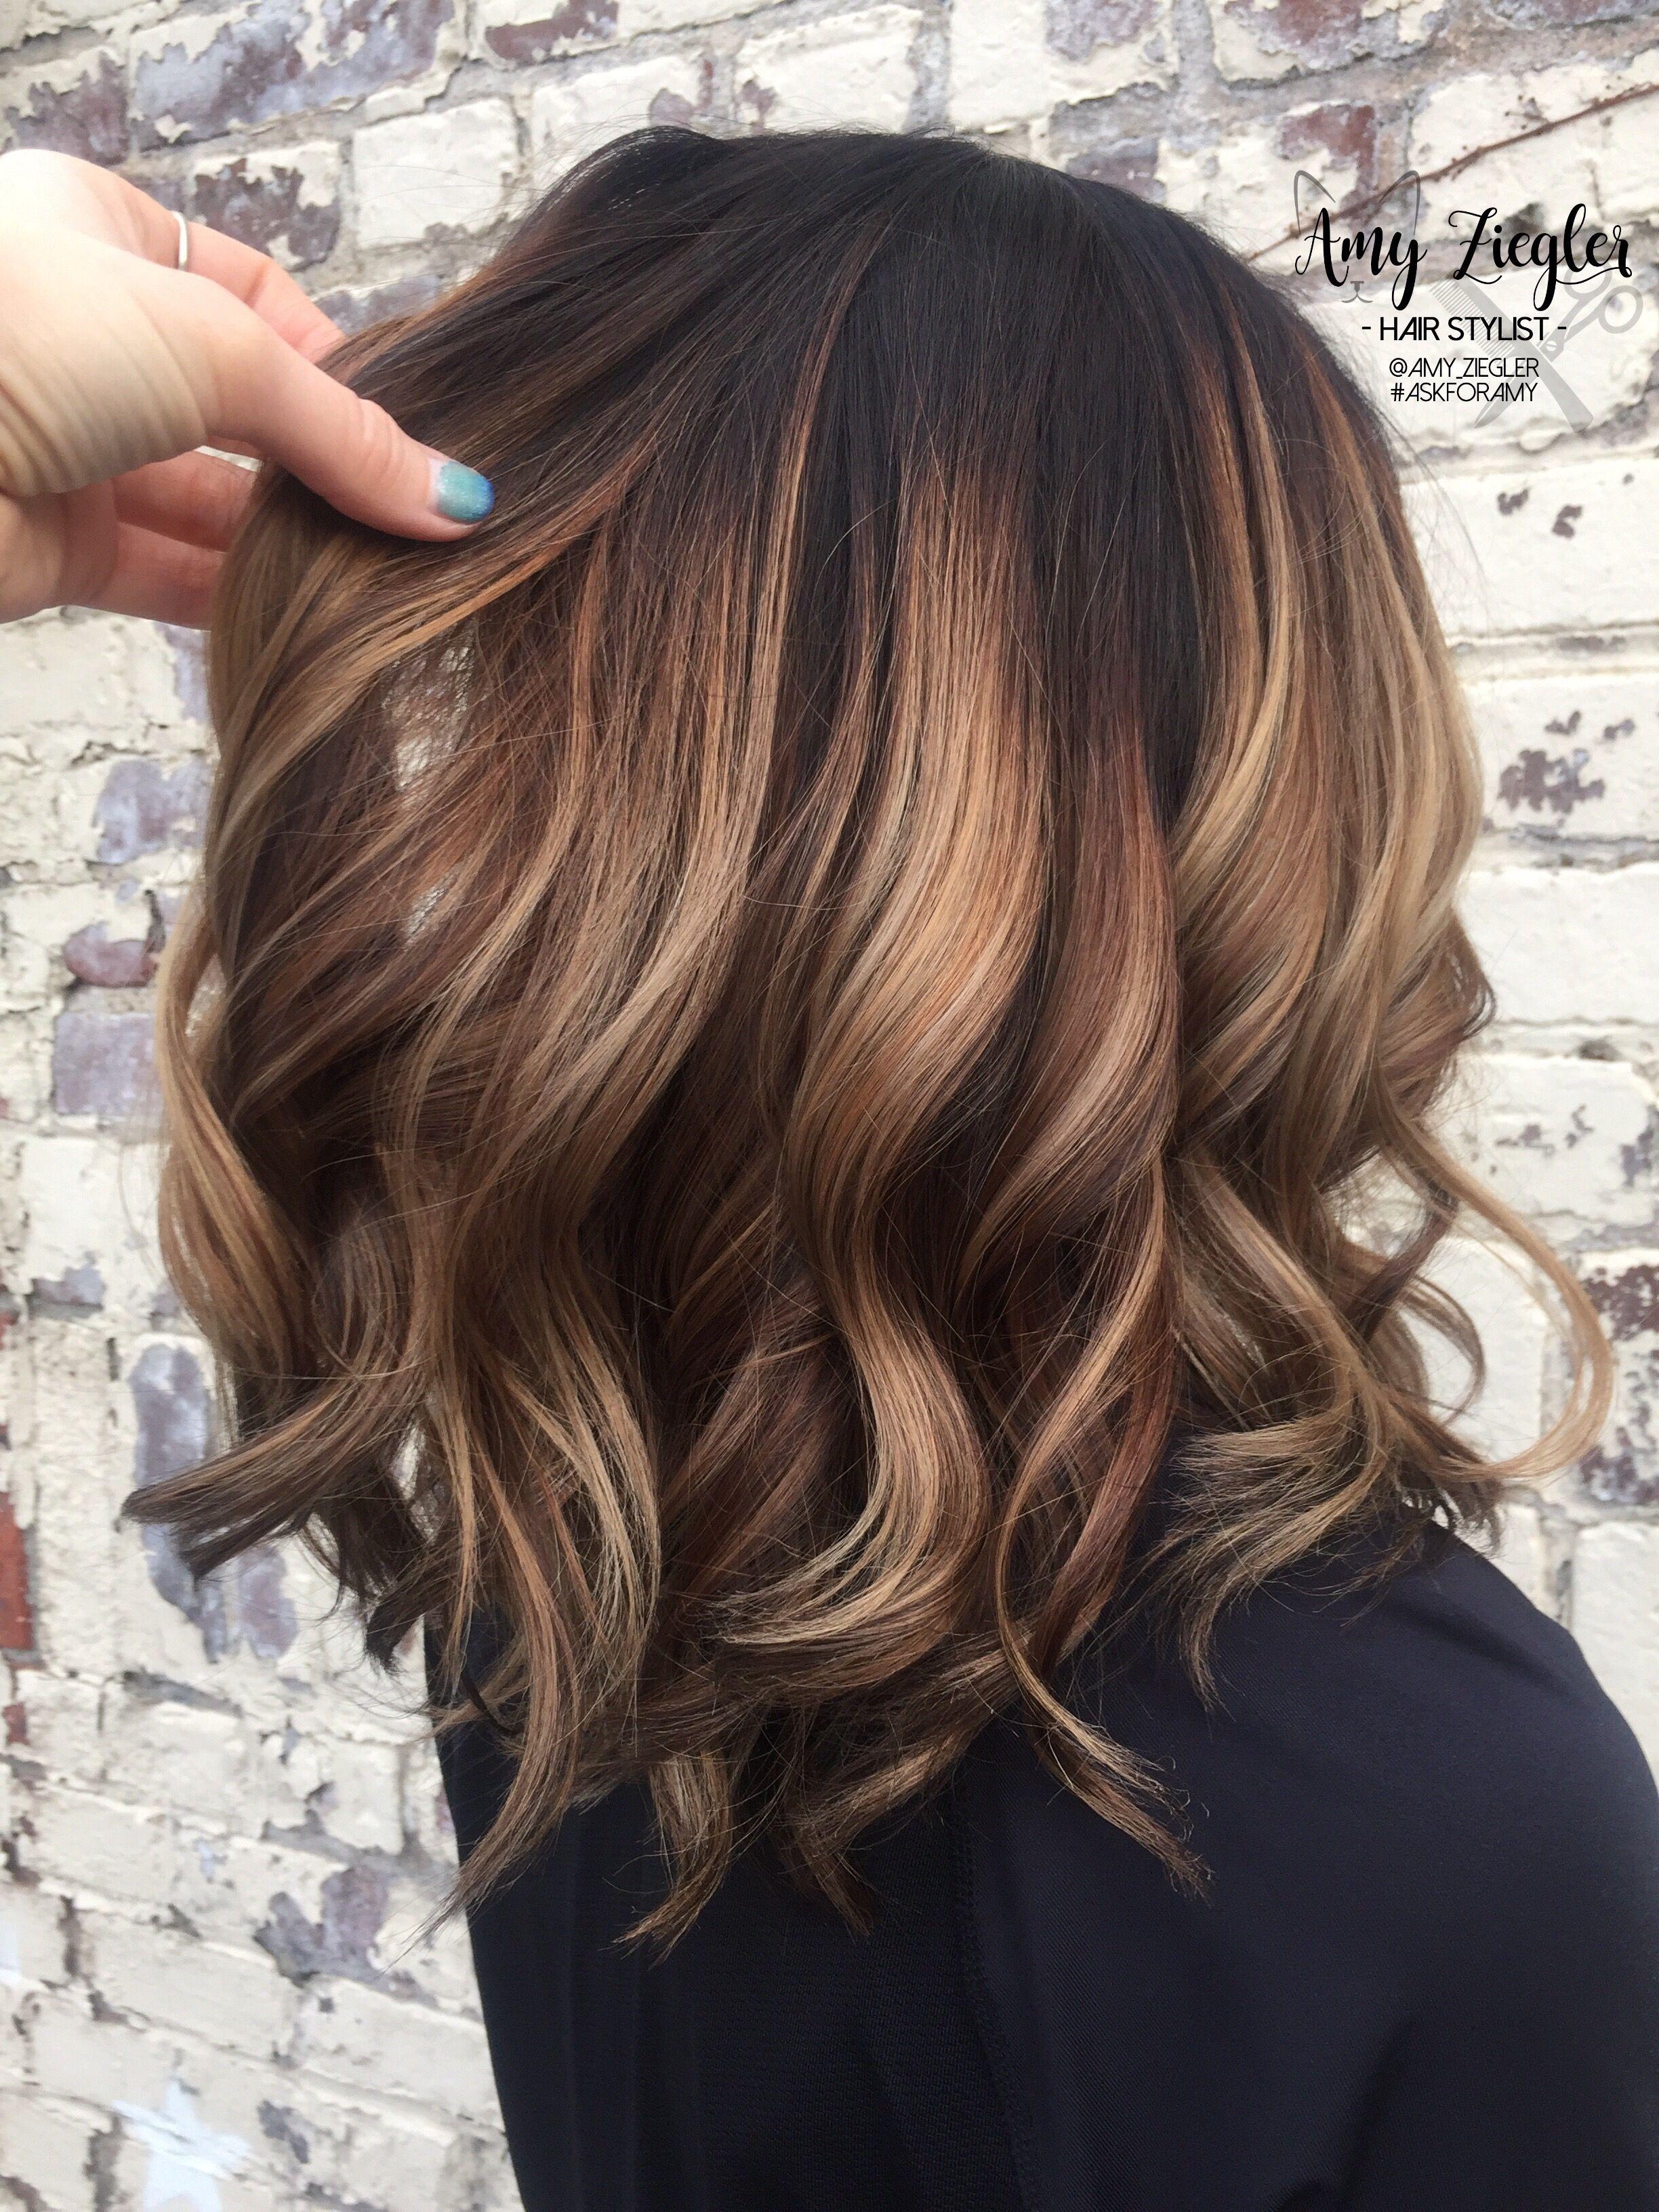 Chunky Blonde Balayage On Dark Hair By Askforamy Askforamy Versatilestrands Hair Styles Brown Hair Balayage Medium Hair Styles